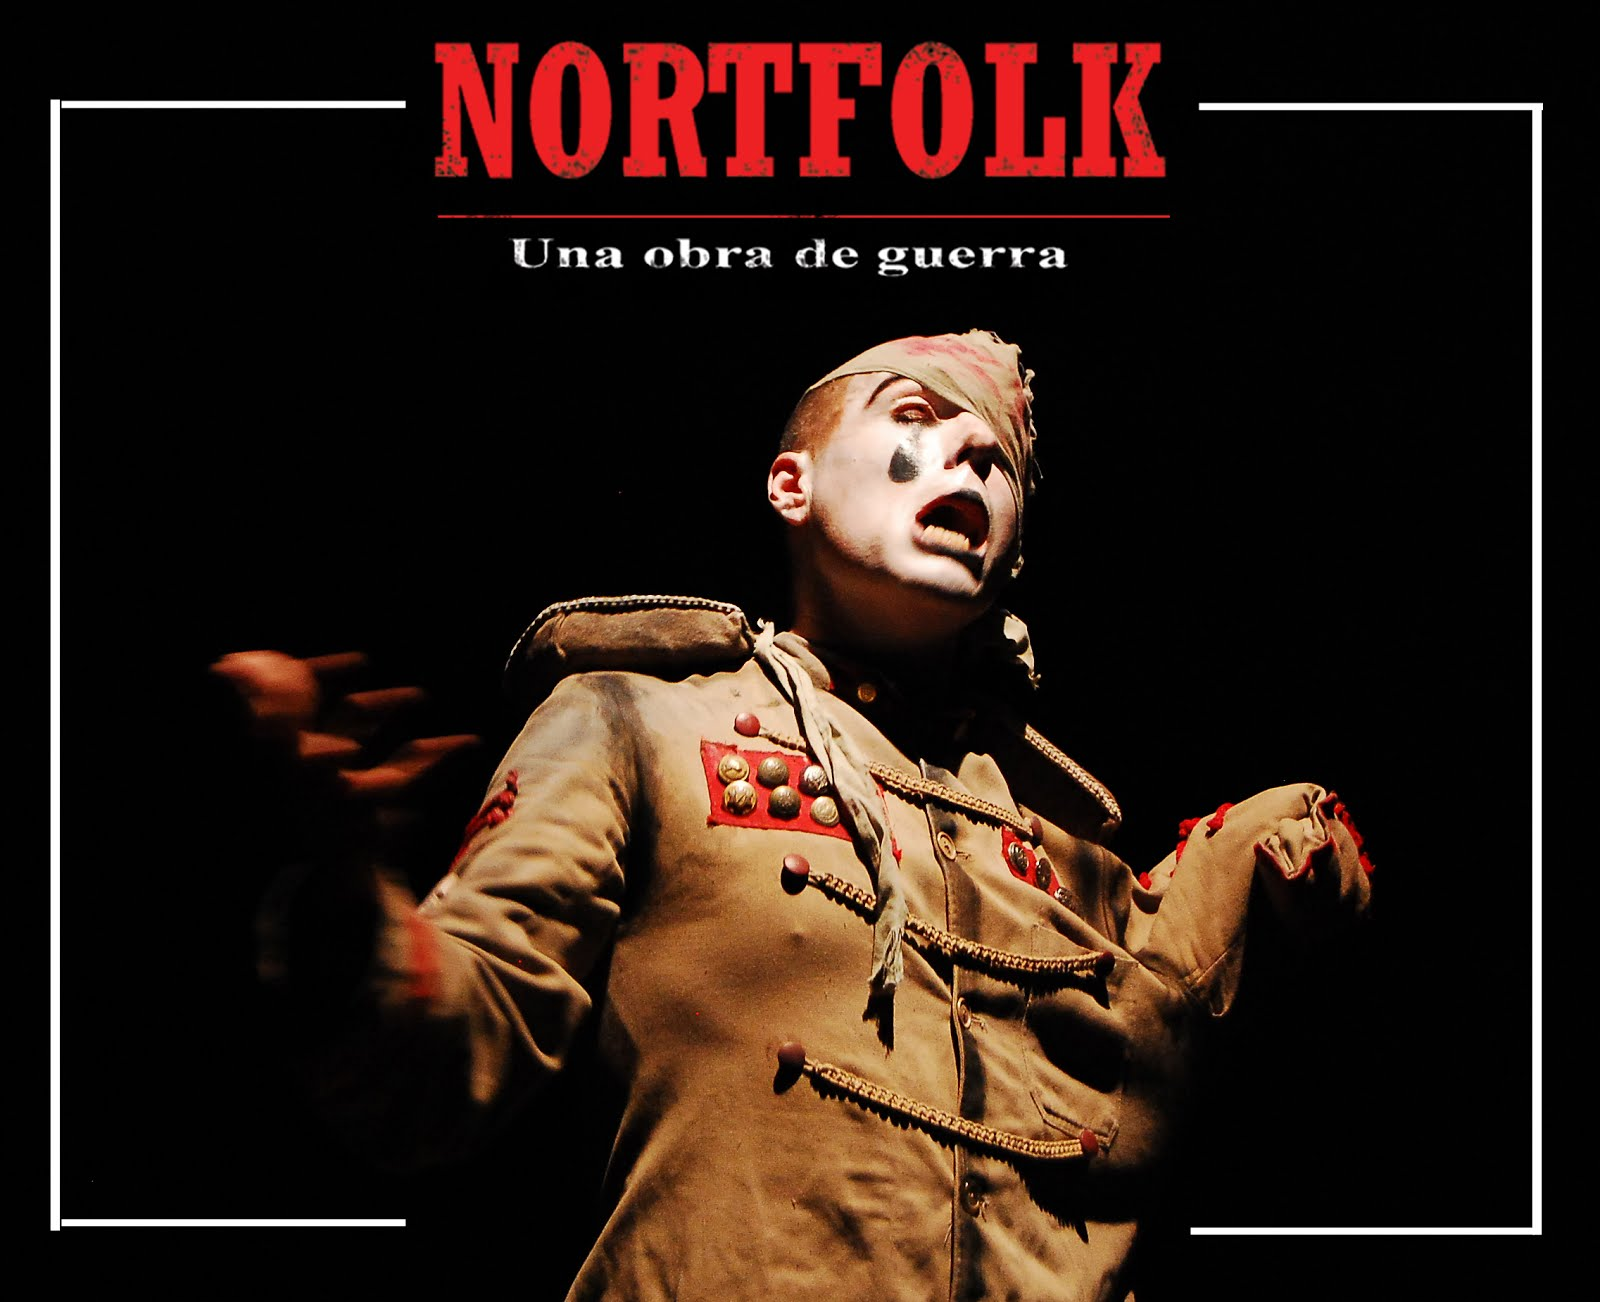 Obra teatral: Nortfolk